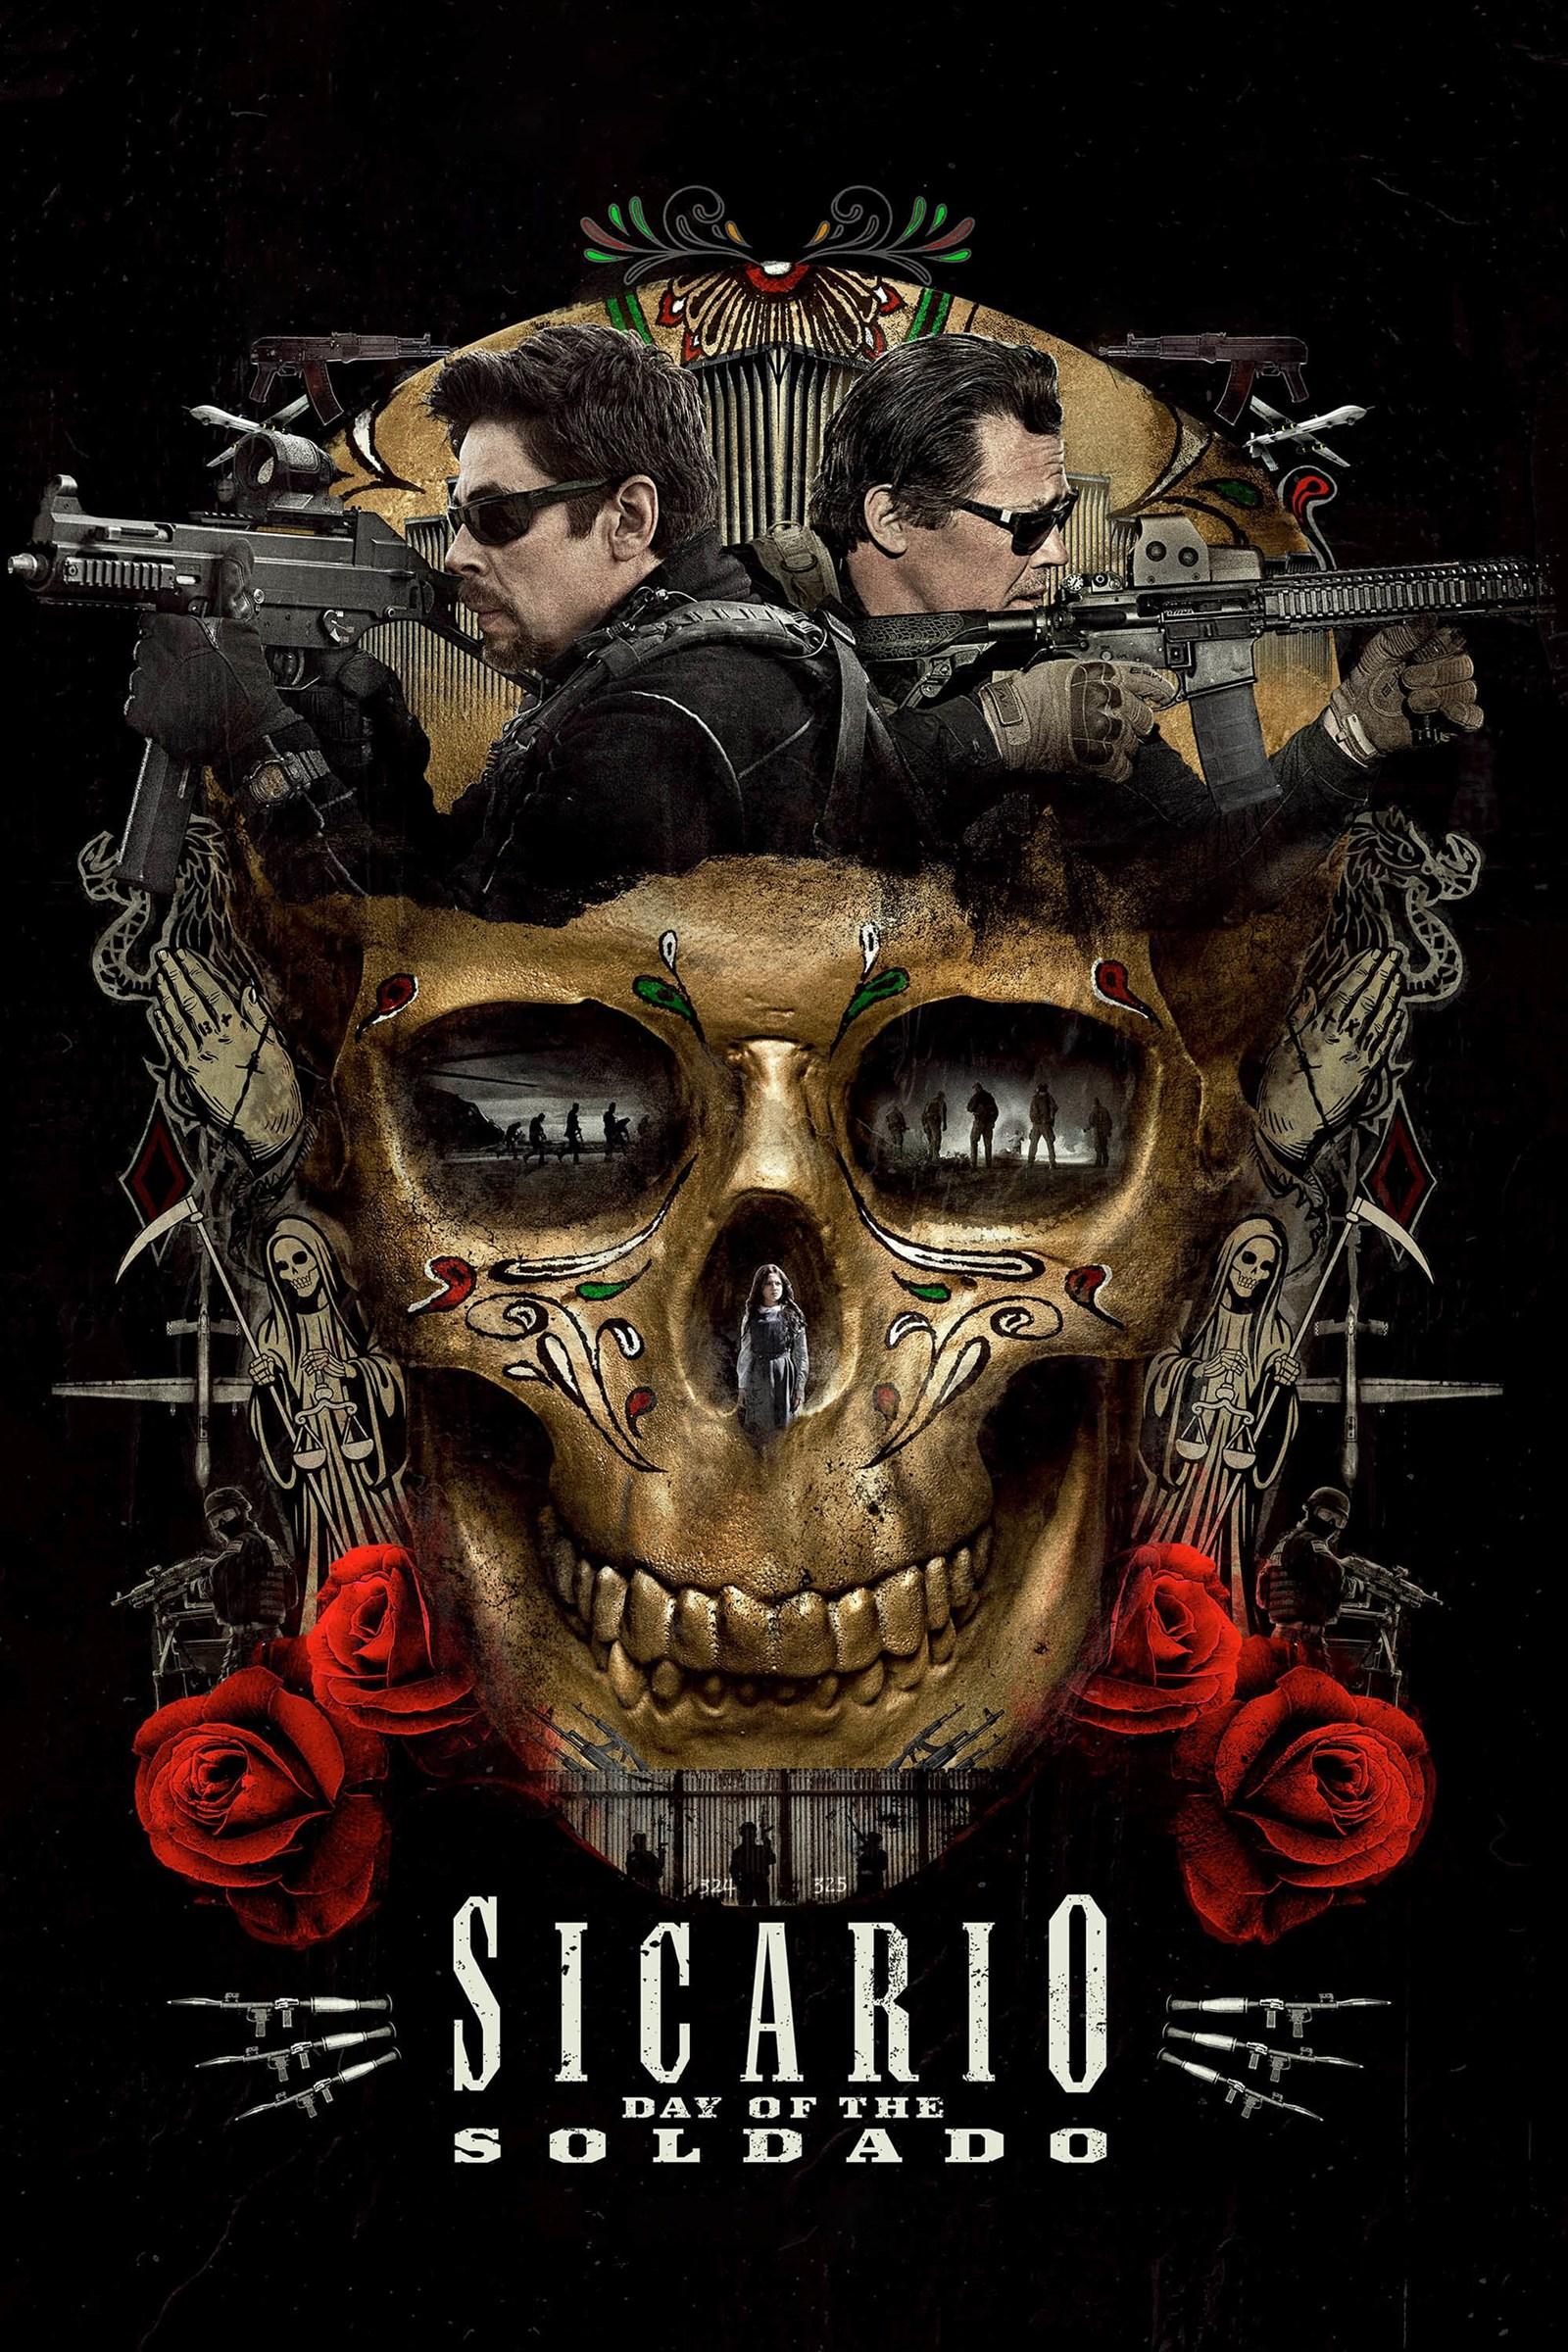 Subscene - Sicario: Day of the Soldado English subtitle